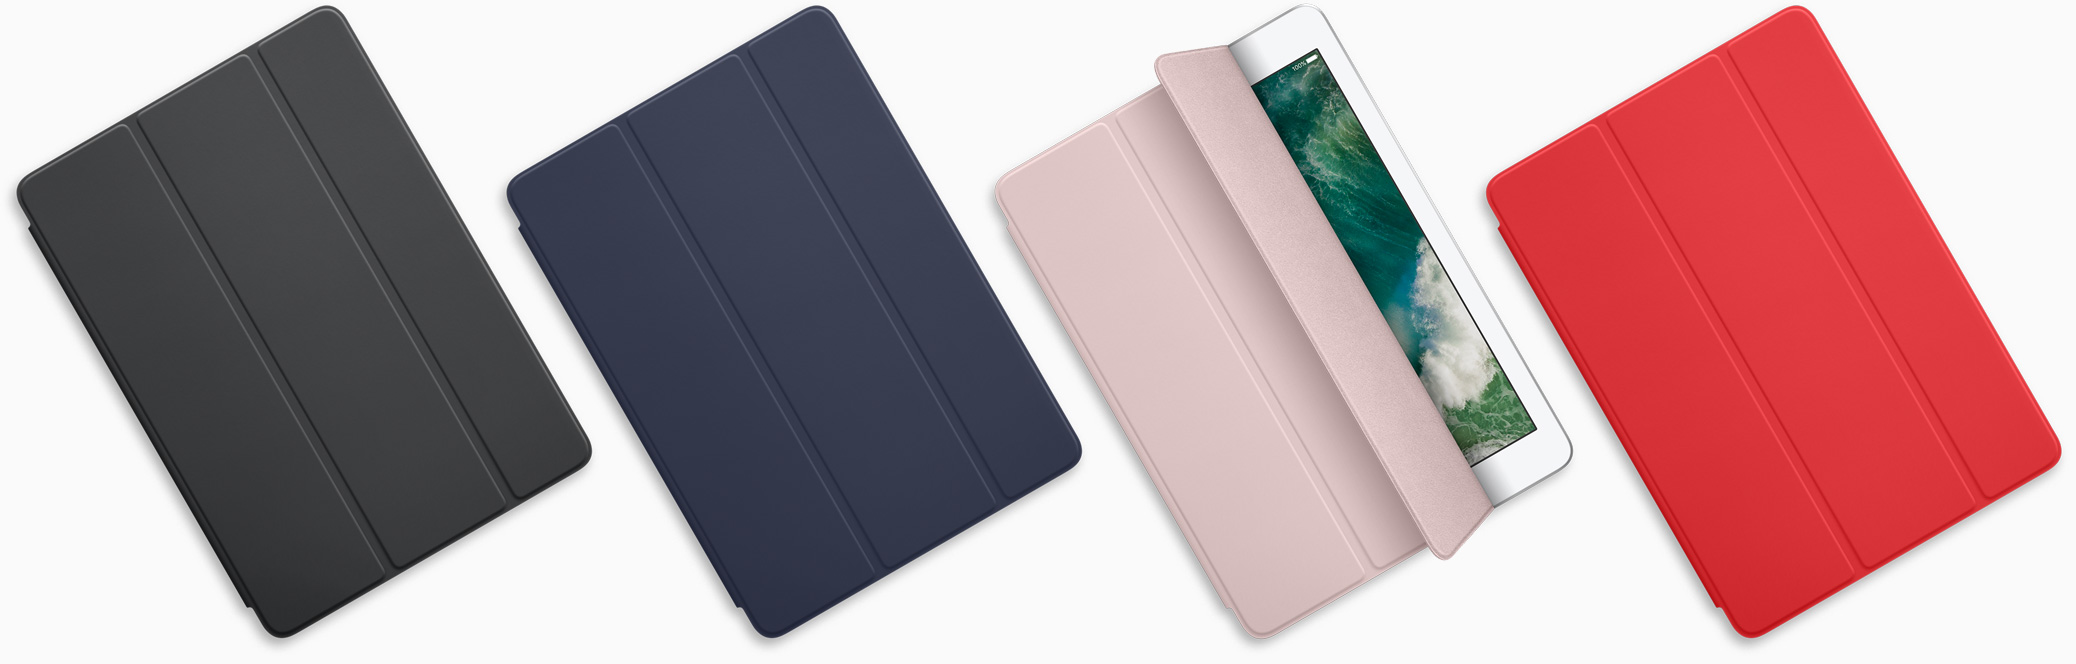 Obaly pro iPad